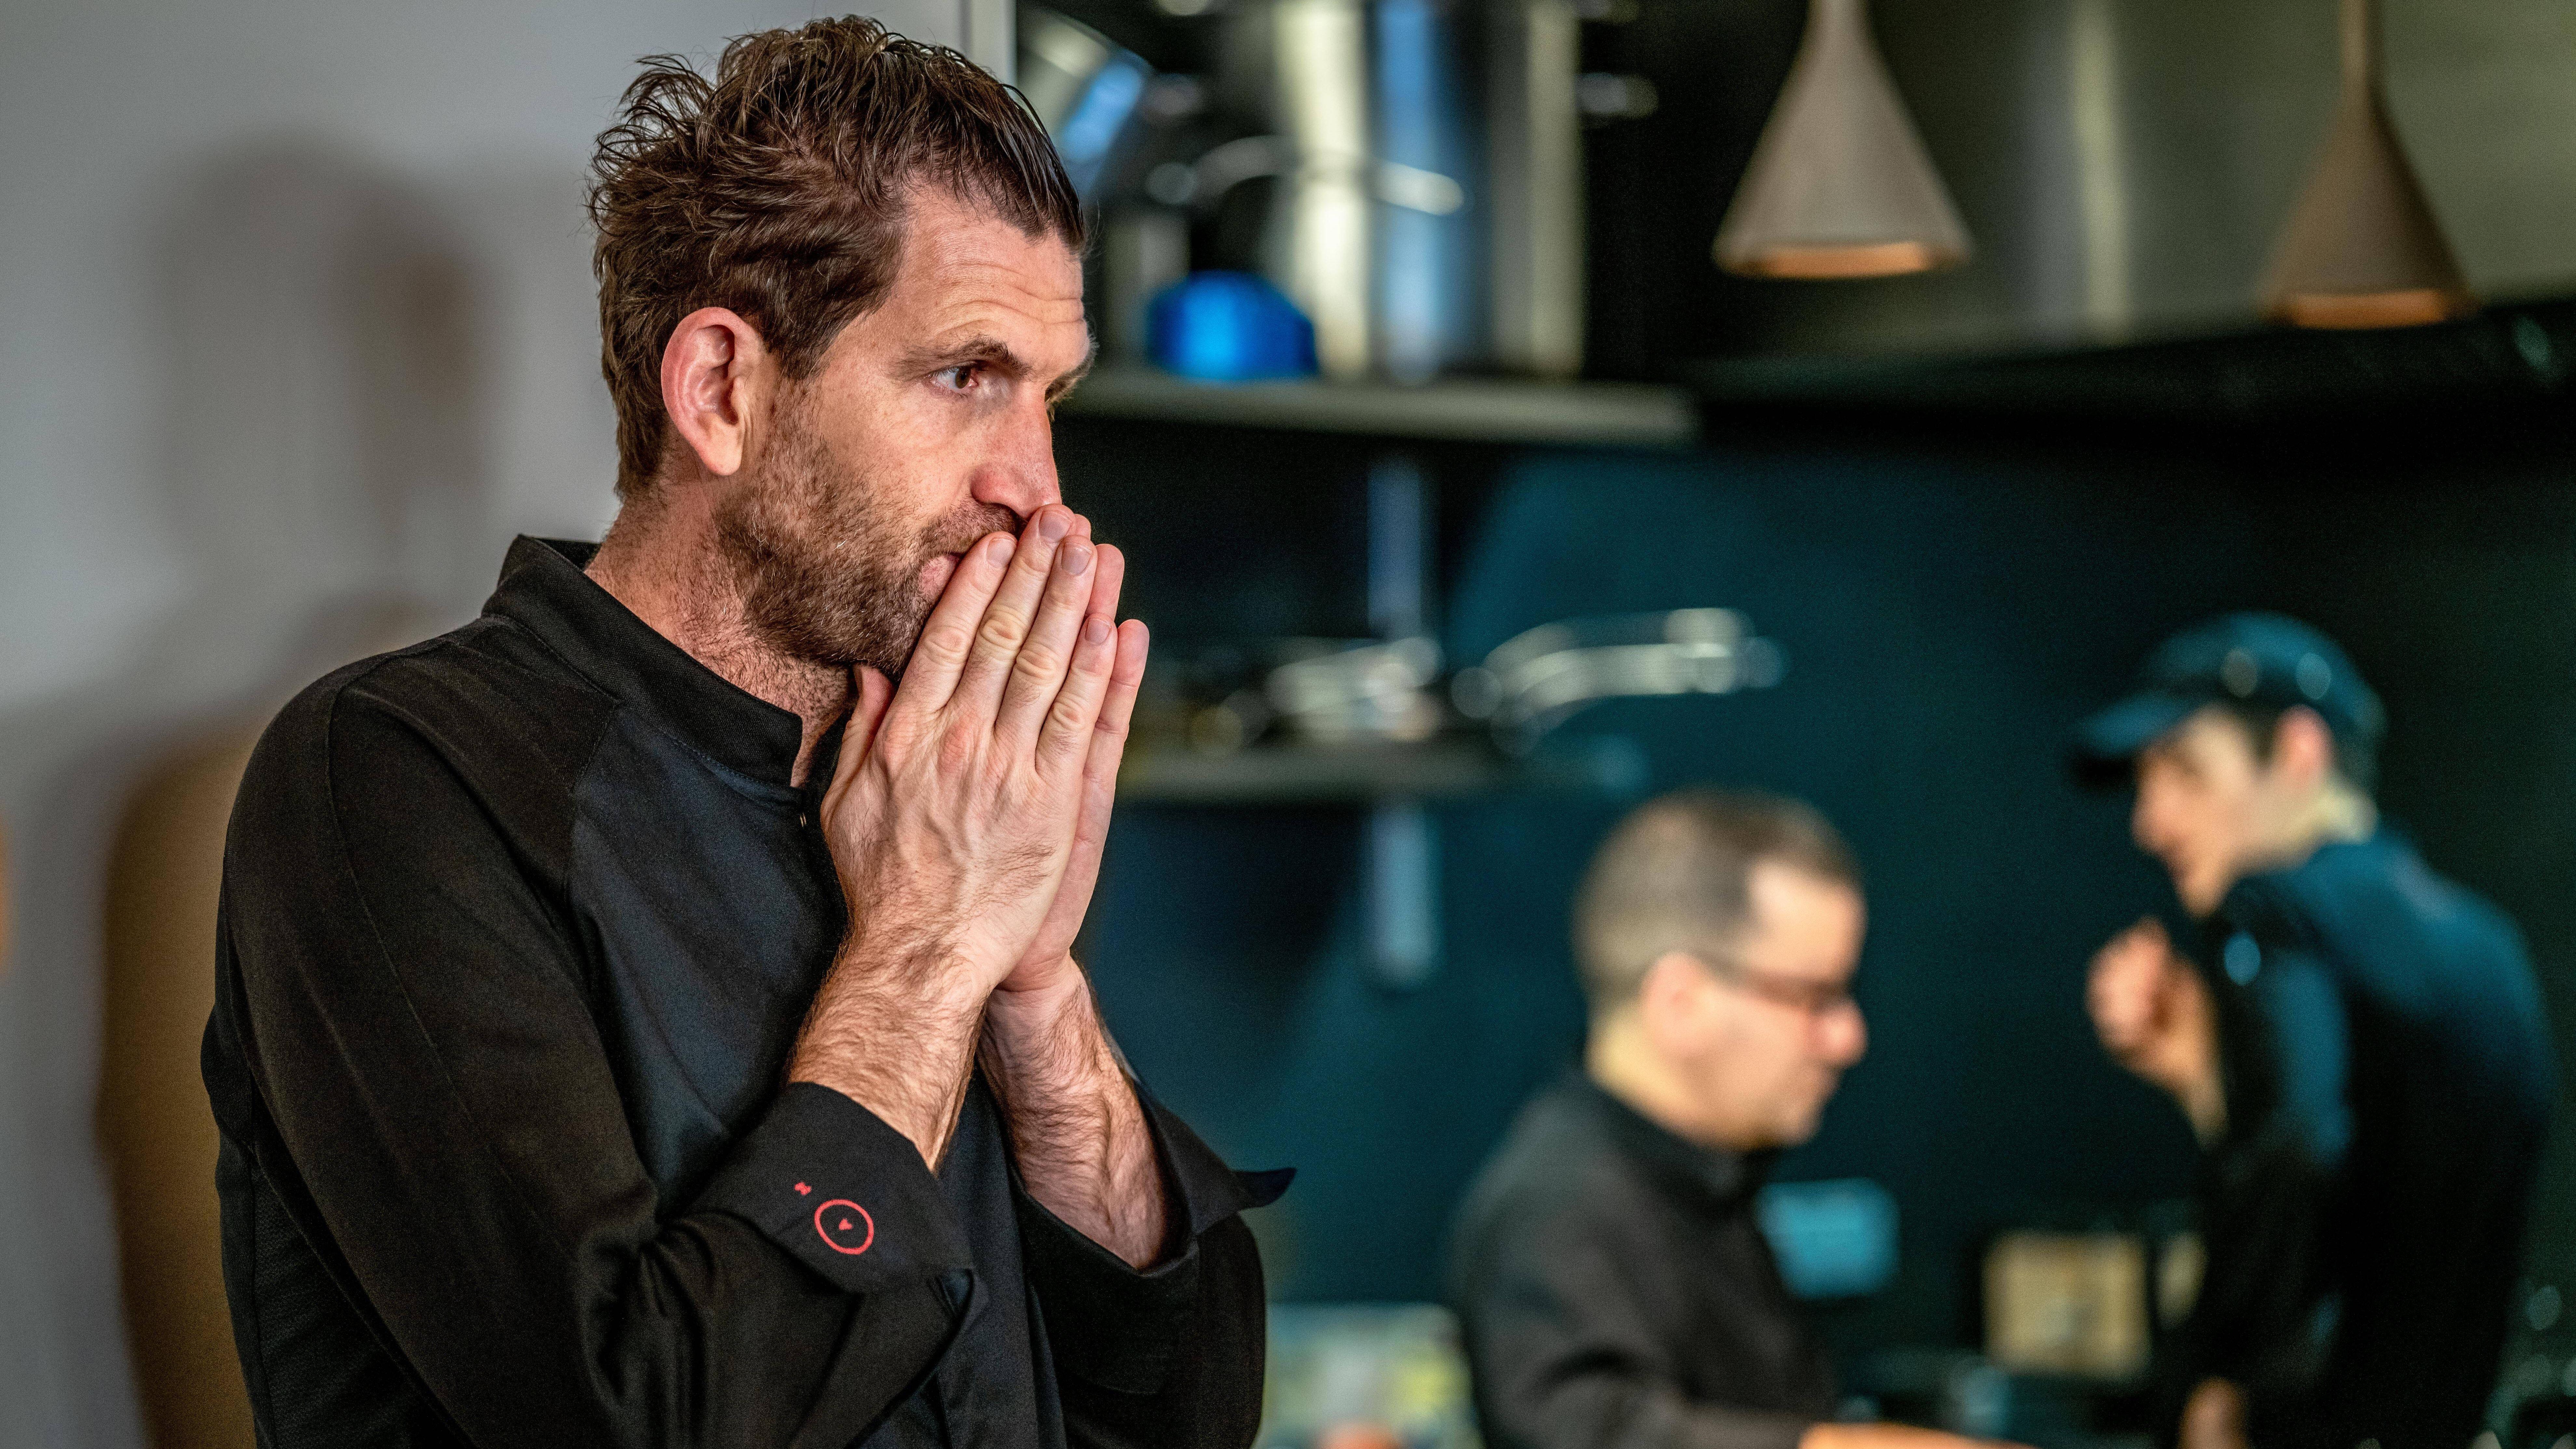 Restaurantkritik-30-mal-3-Sterne-f-r-Frankreich